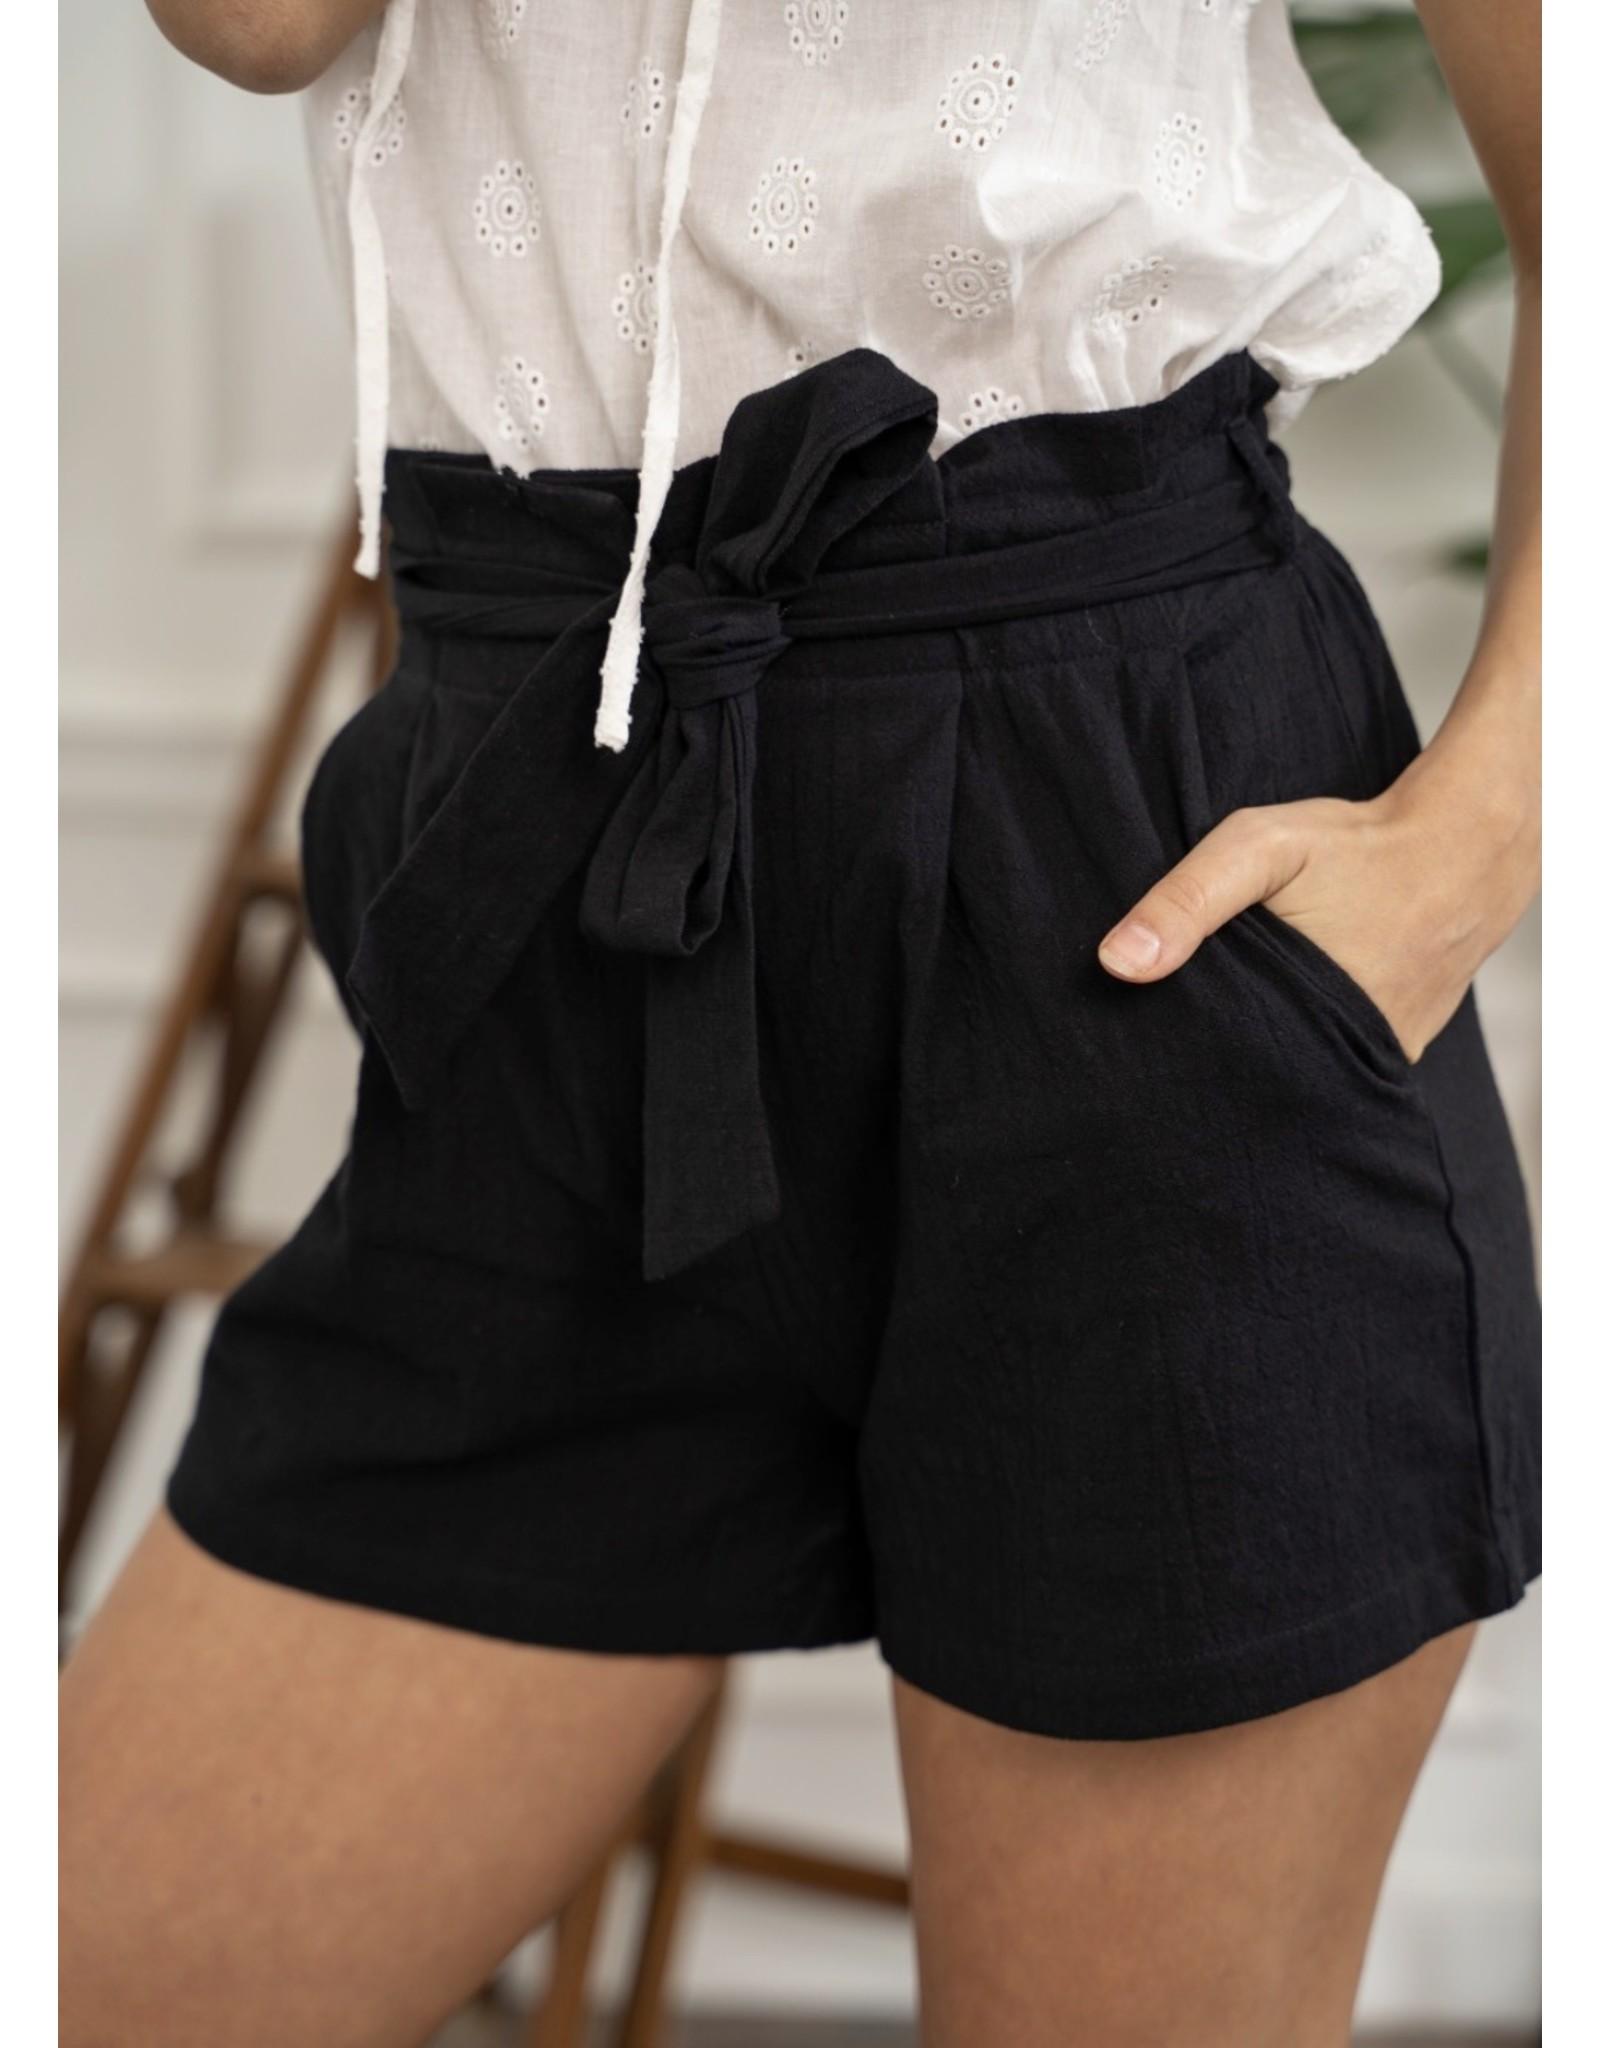 Kilky Black Classy Shorts